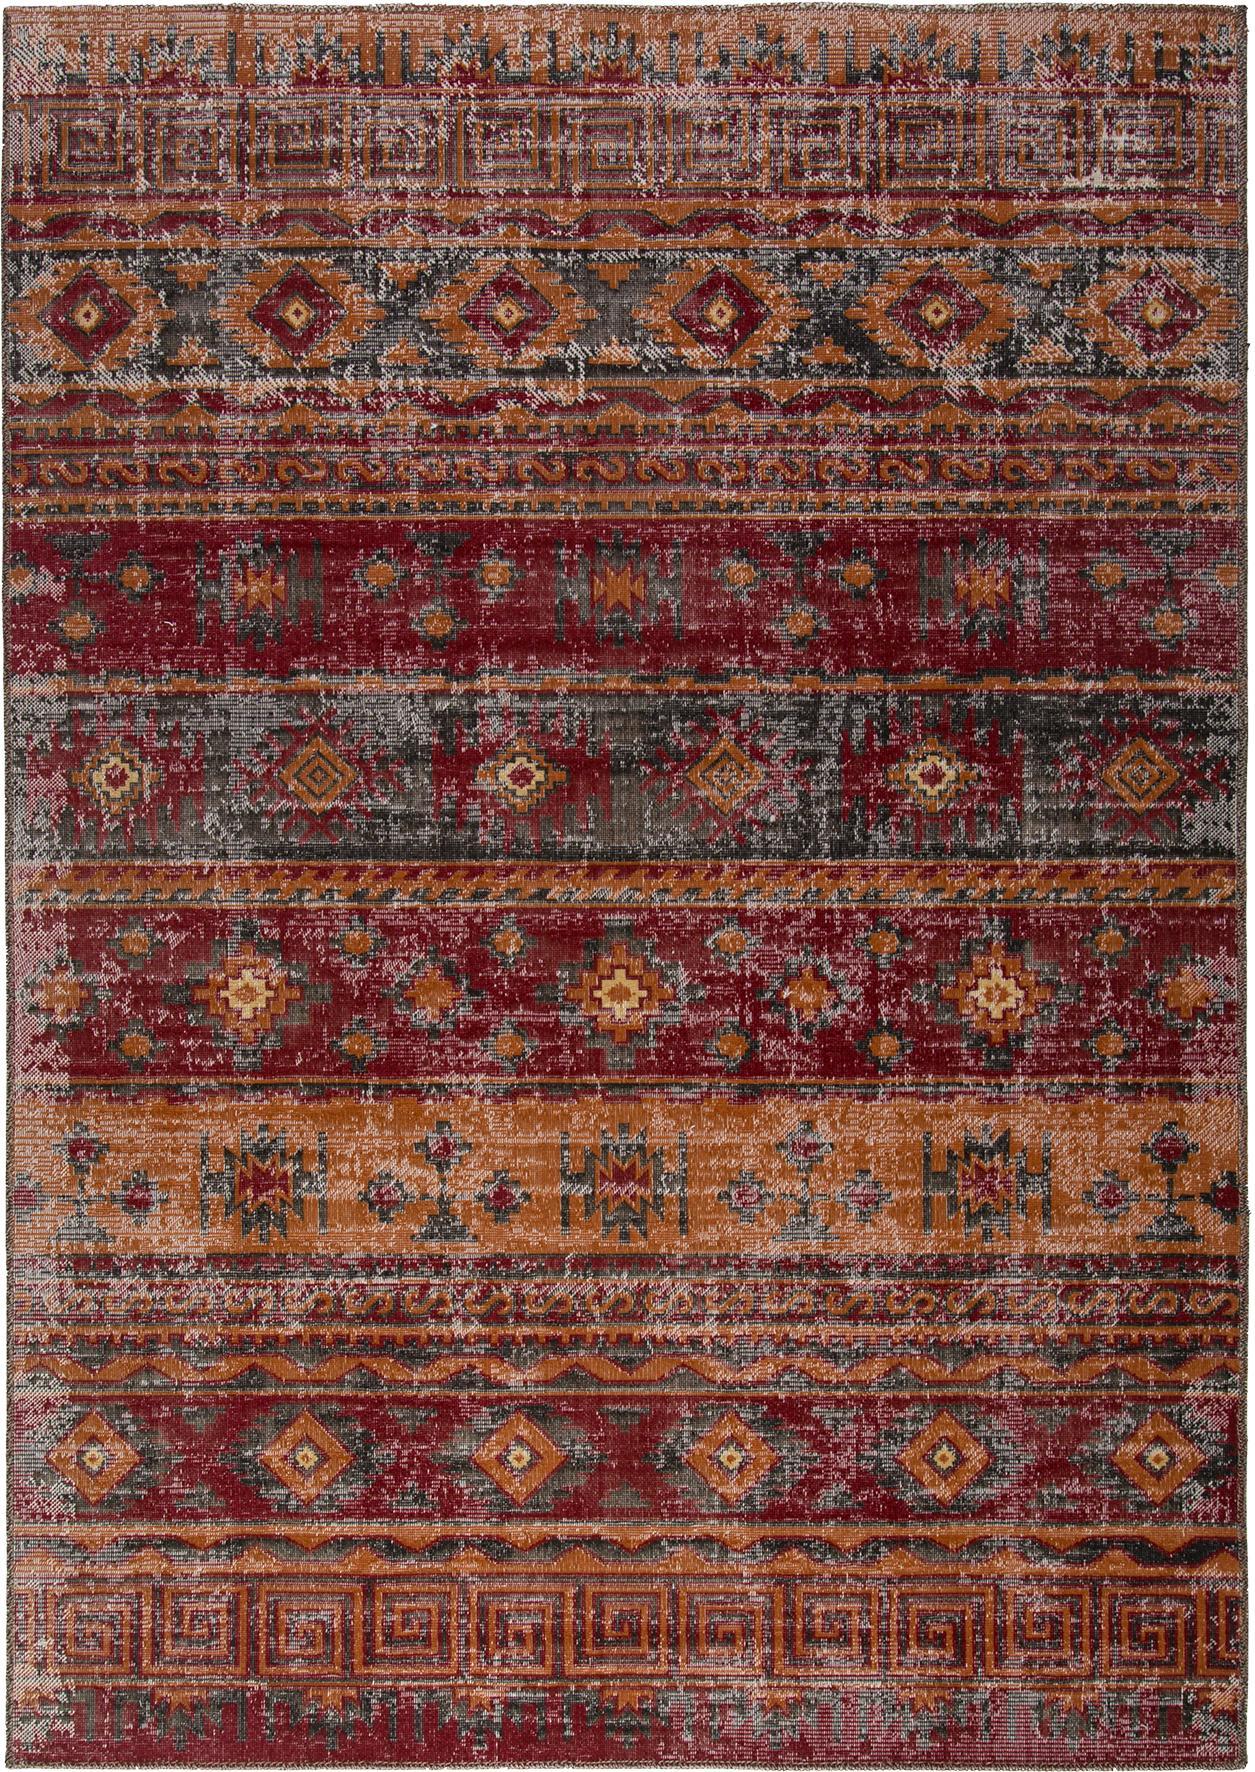 Alfombra de interior/exterior Tilas Istanbul, estilo oriental, Rojo oscuro, mostaza, caqui, An 160 x L 230 cm (Tamaño M)